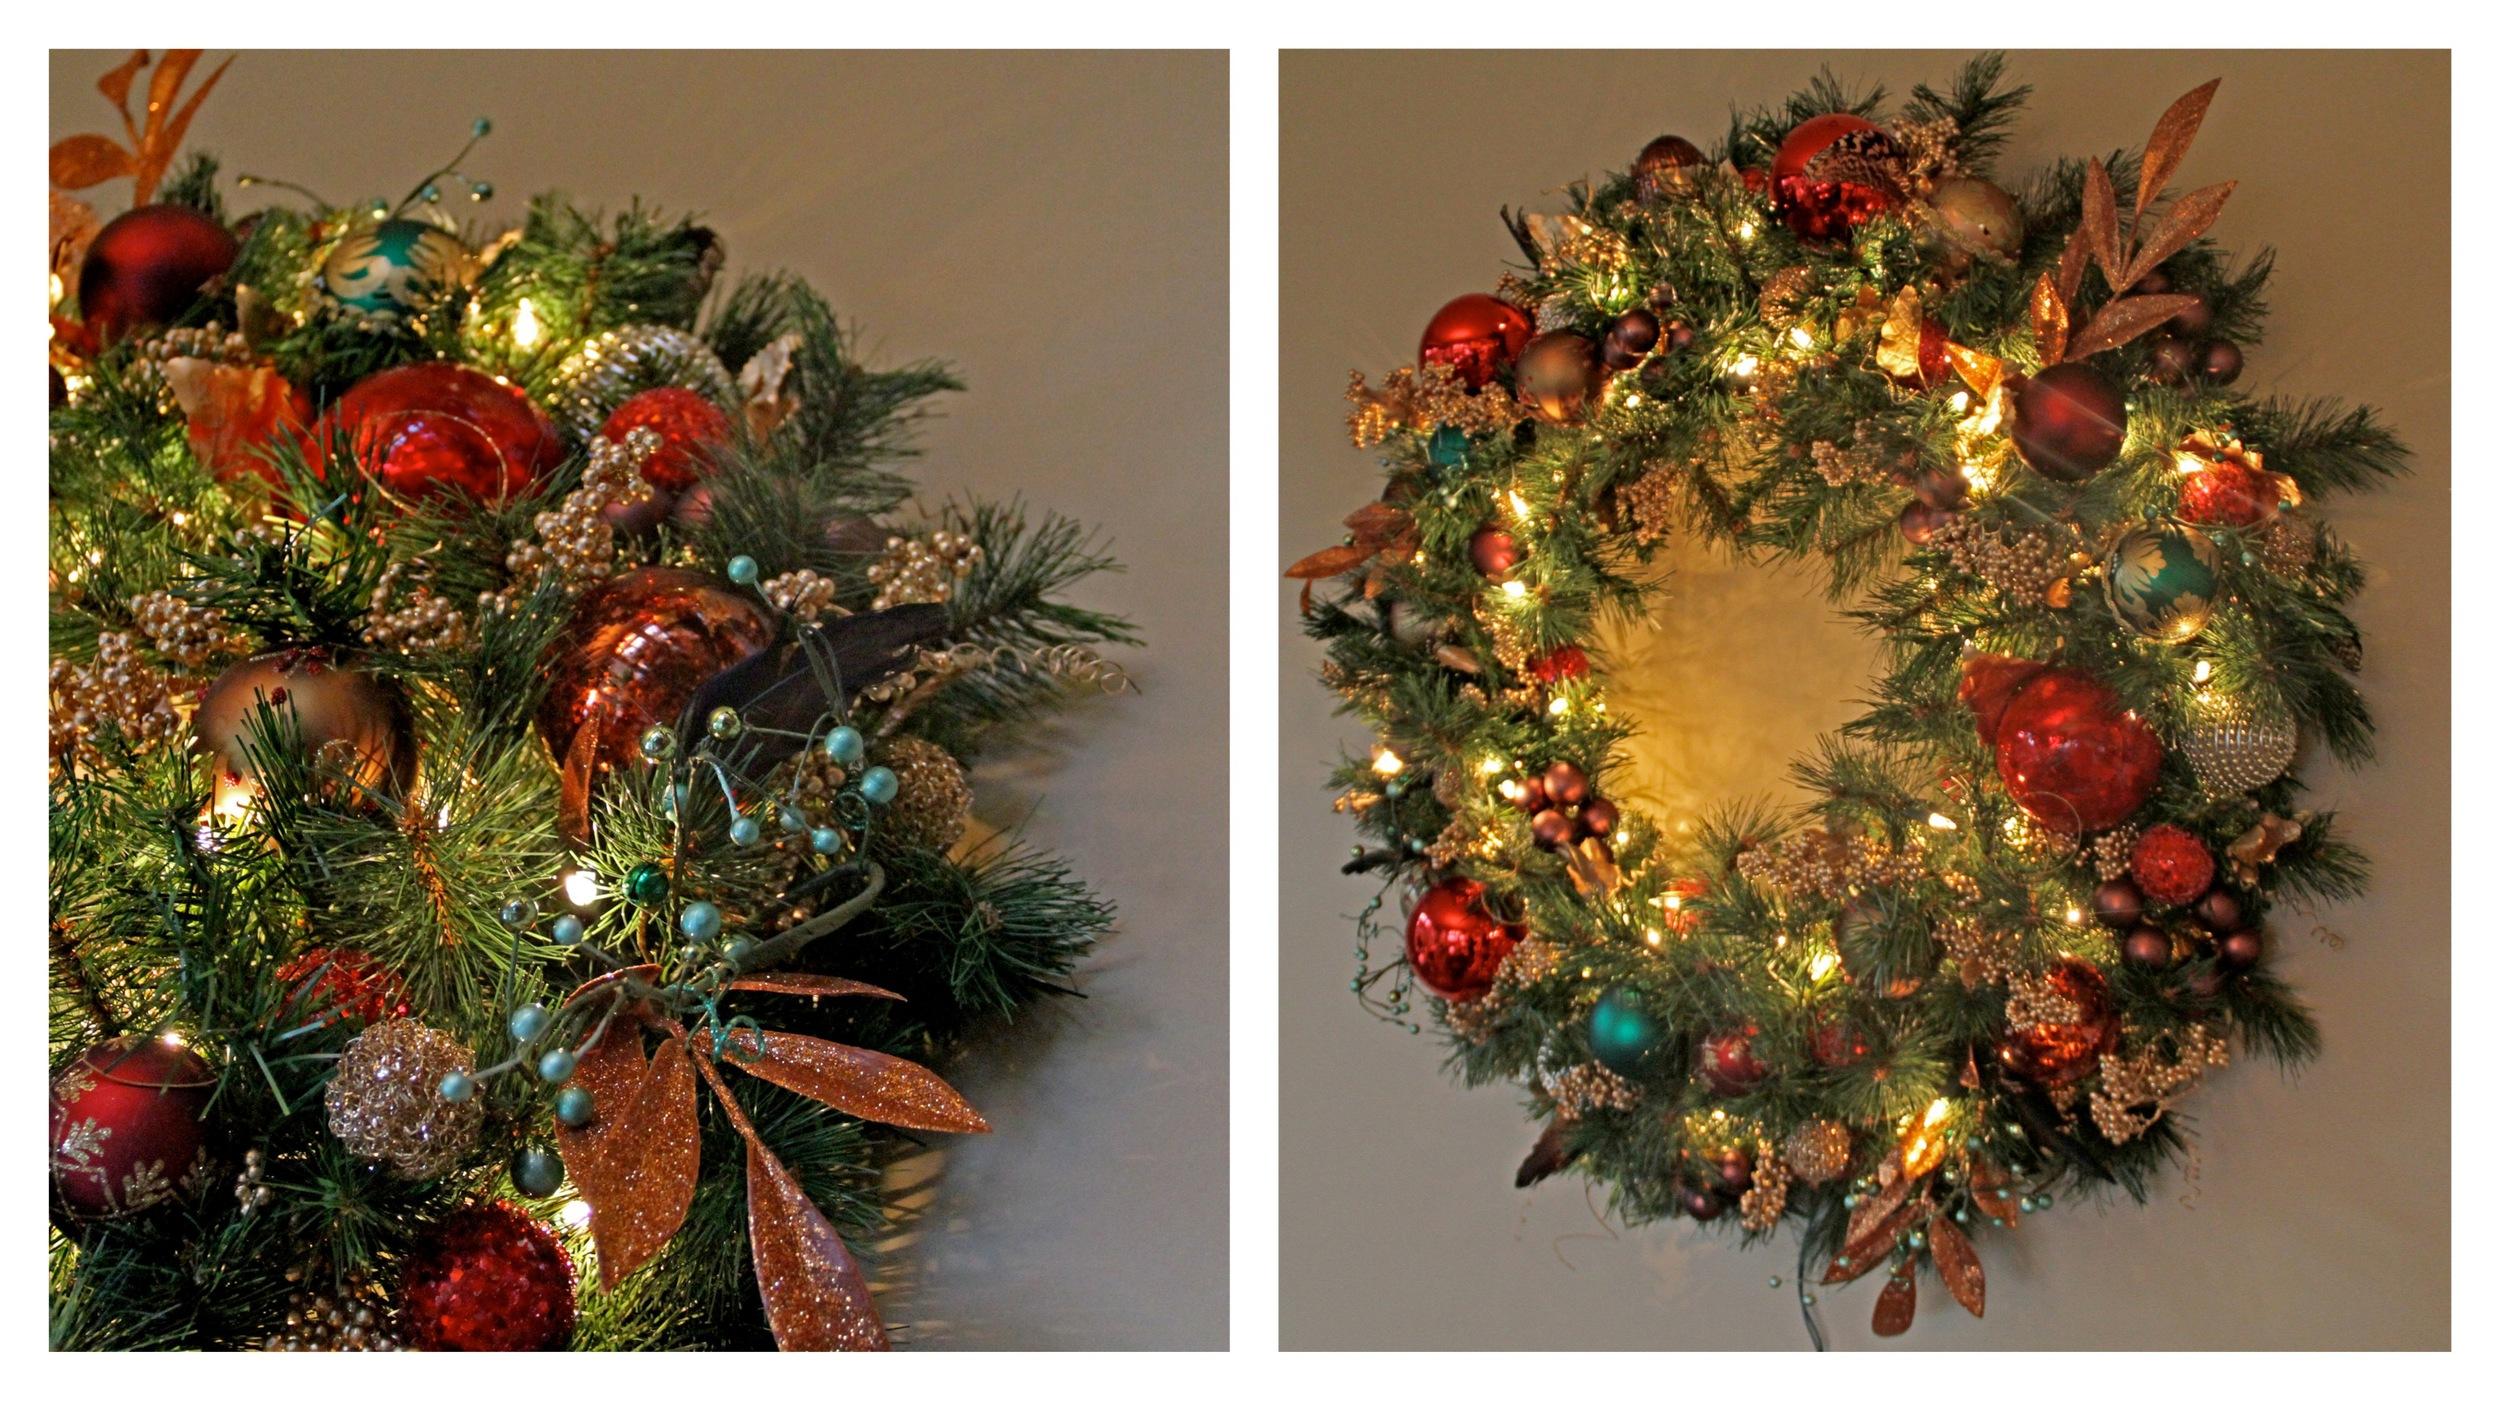 thompson wreath 2.jpg